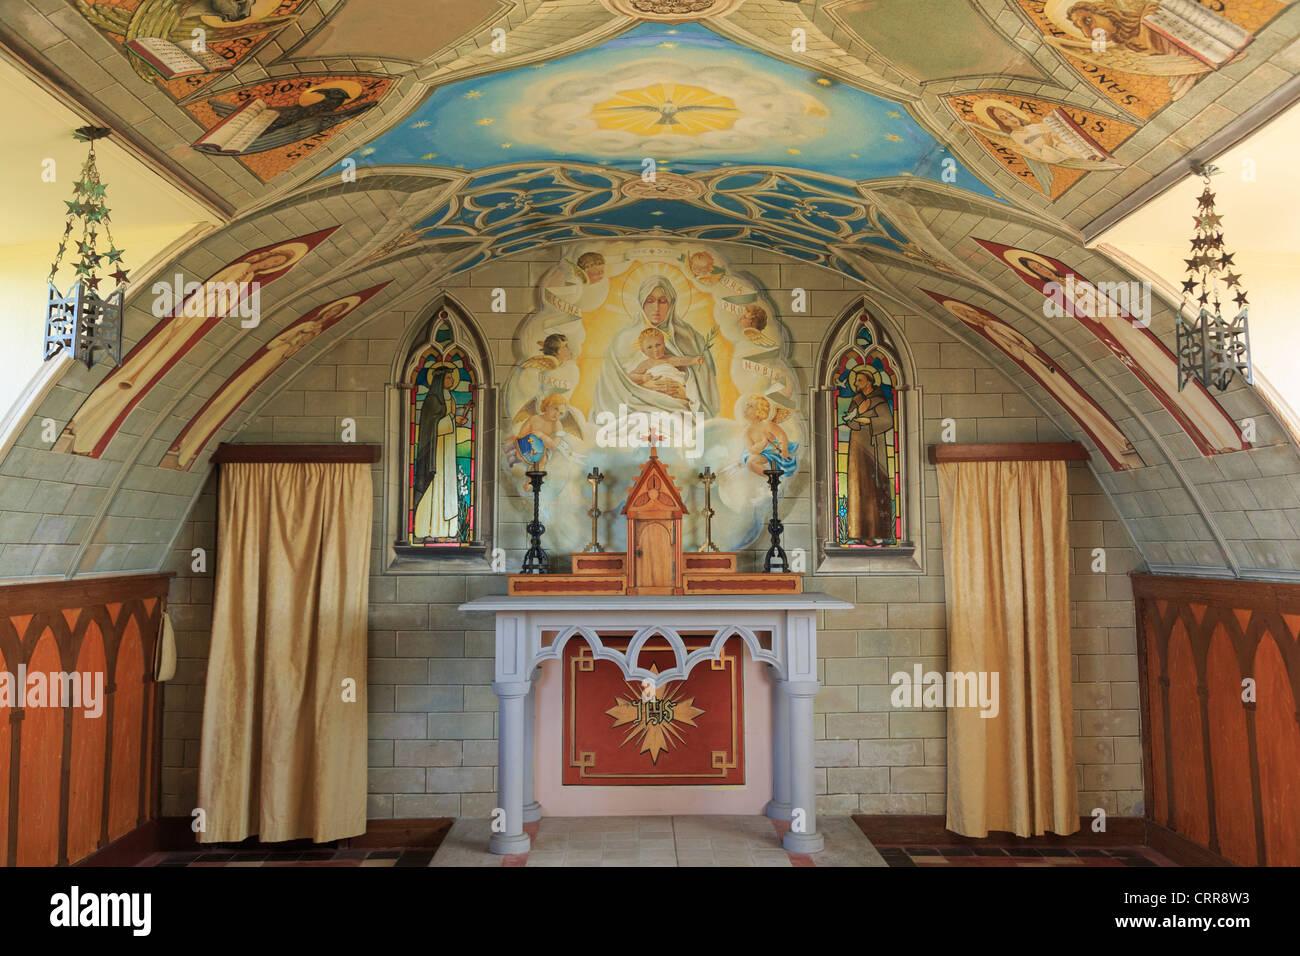 Italian Chapel ornate interior built from 2 Nissen huts by Italian prisoners of world war II on Lamb Holm, Orkney, - Stock Image